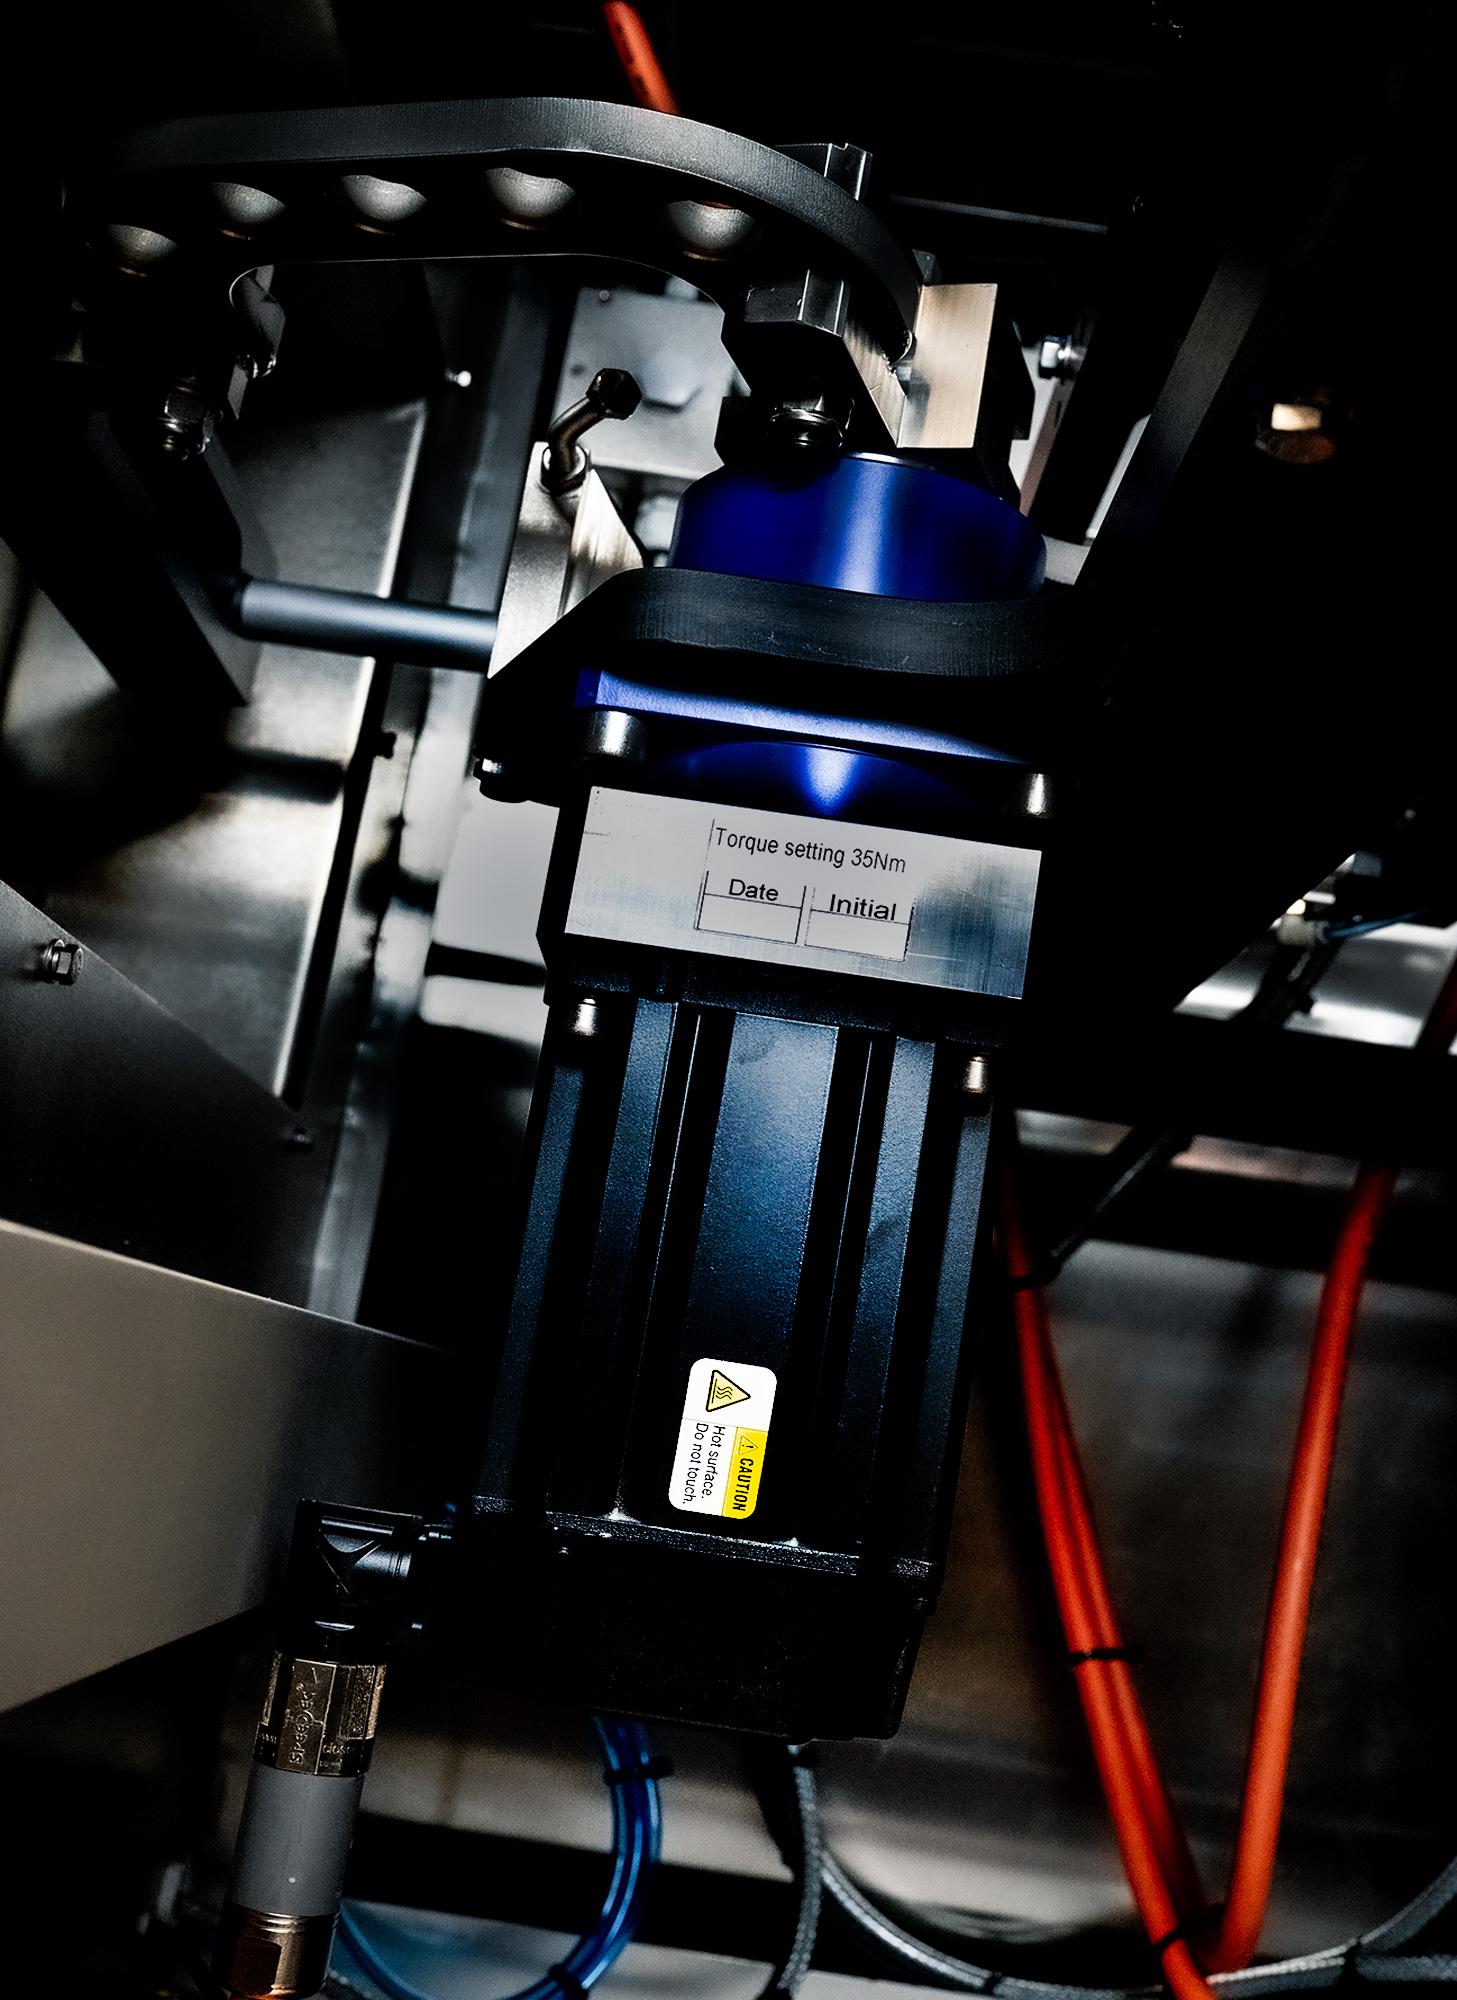 gic 4100 vffs bagging machine uk manufacturer